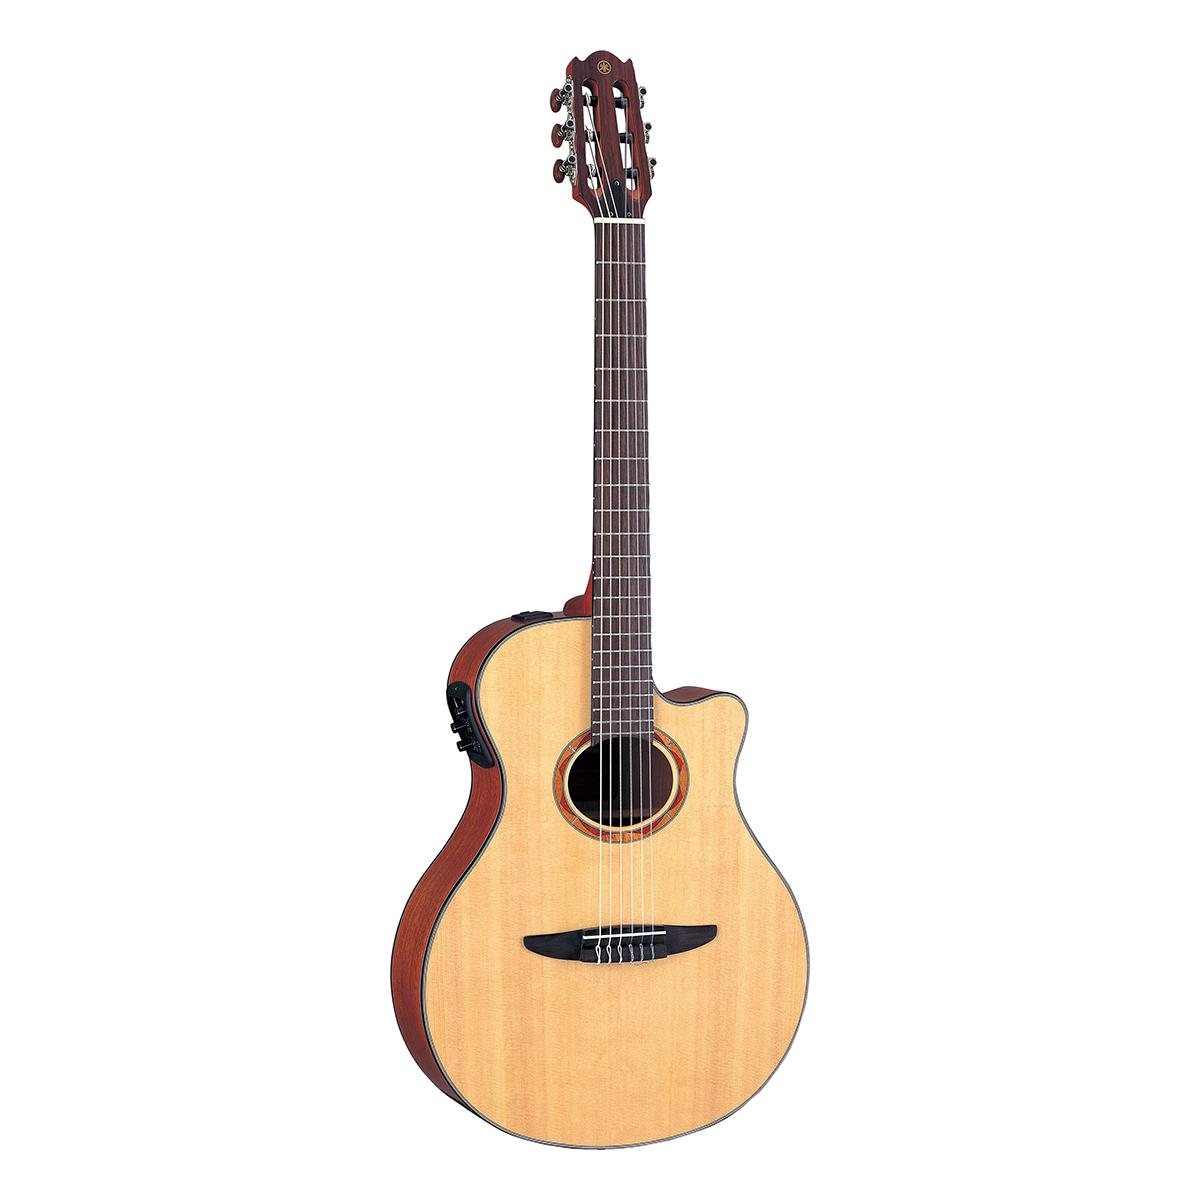 Yamaha - NTX700 Guitare avec corde nylon